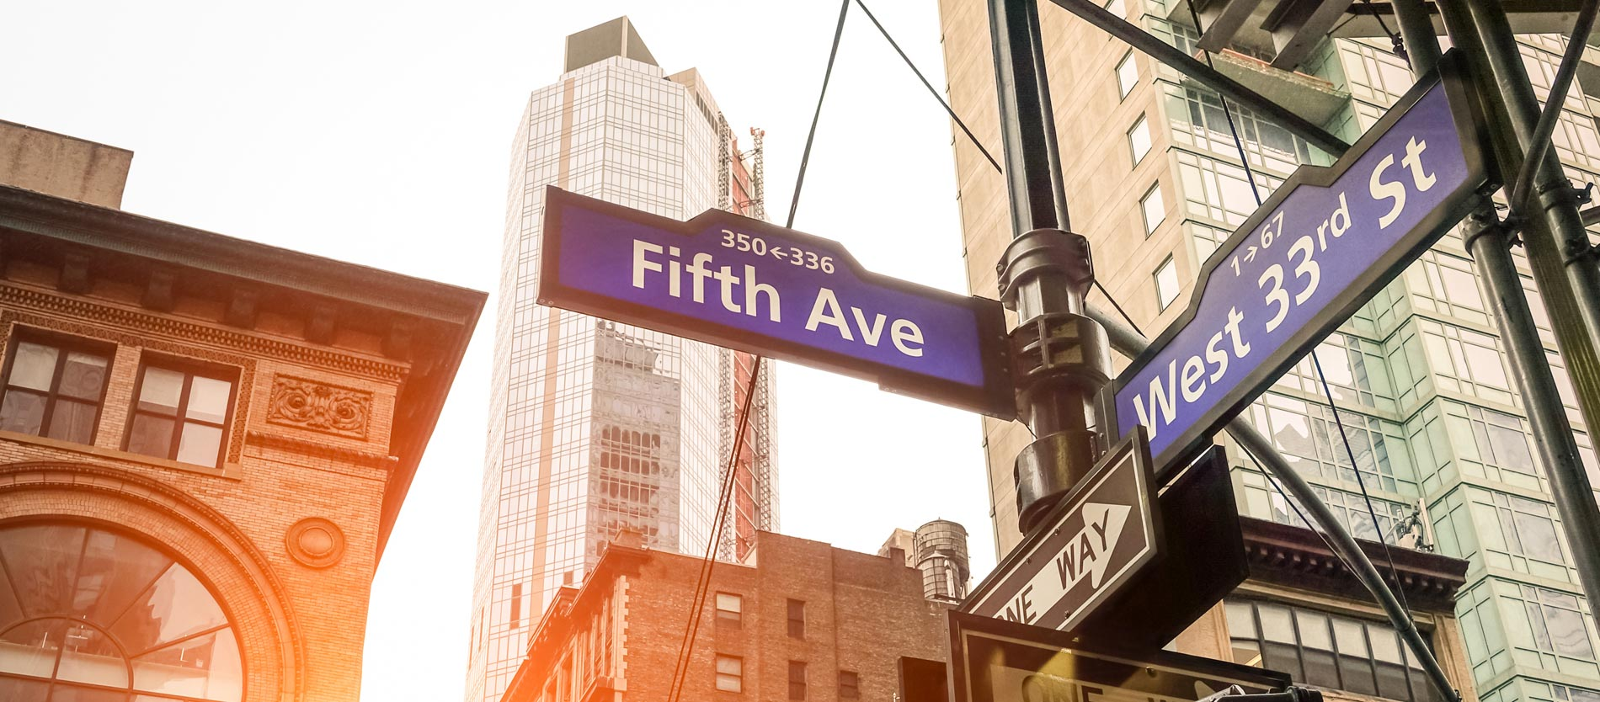 Top 10 μπαρ σεξ στη Νέα Υόρκη το εργένικο μαξιλάρι Τρικάλων και lindzi dating